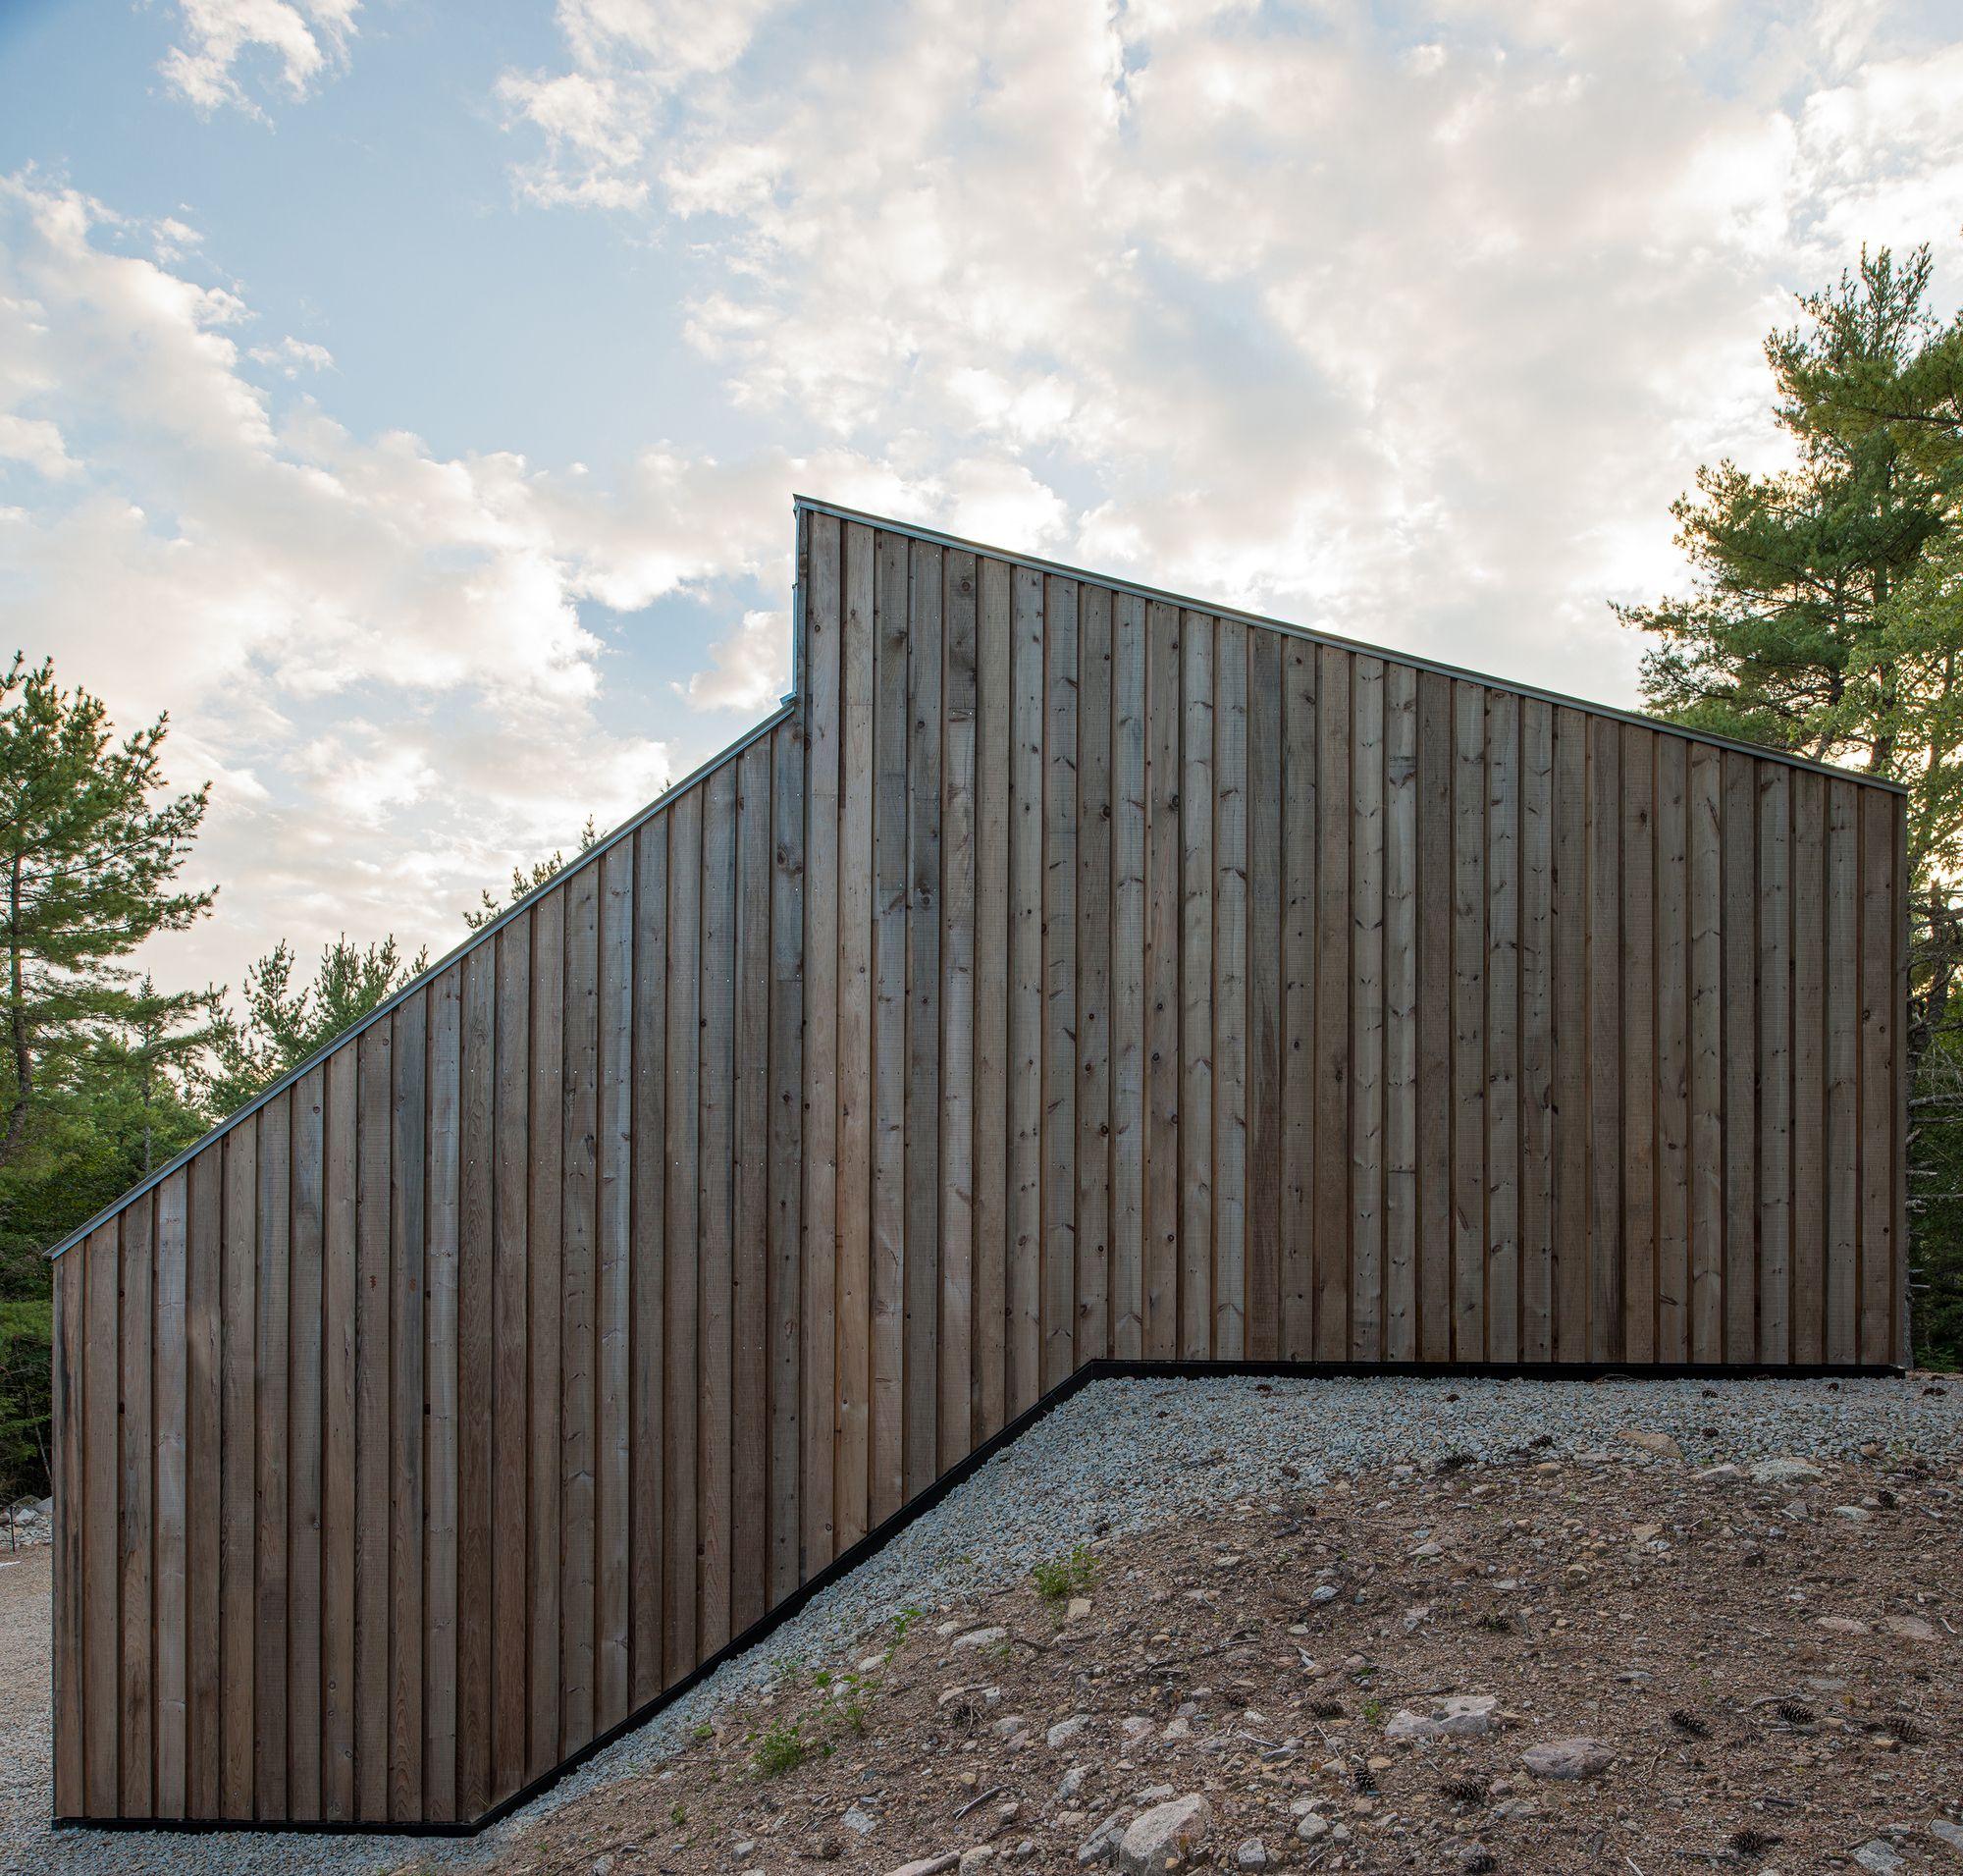 "Moore Studio, Omar Gandhi Architect, Hubbards, Nova Scotia, Canada, 2012 © Greg Richardson Photography Cite: ""Moore Studio / Omar Gandhi Architect"" 21 Sep 2012. ArchDaily. Accessed 06 Sep 2014. <http://www.archdaily.com/?p=272860>"